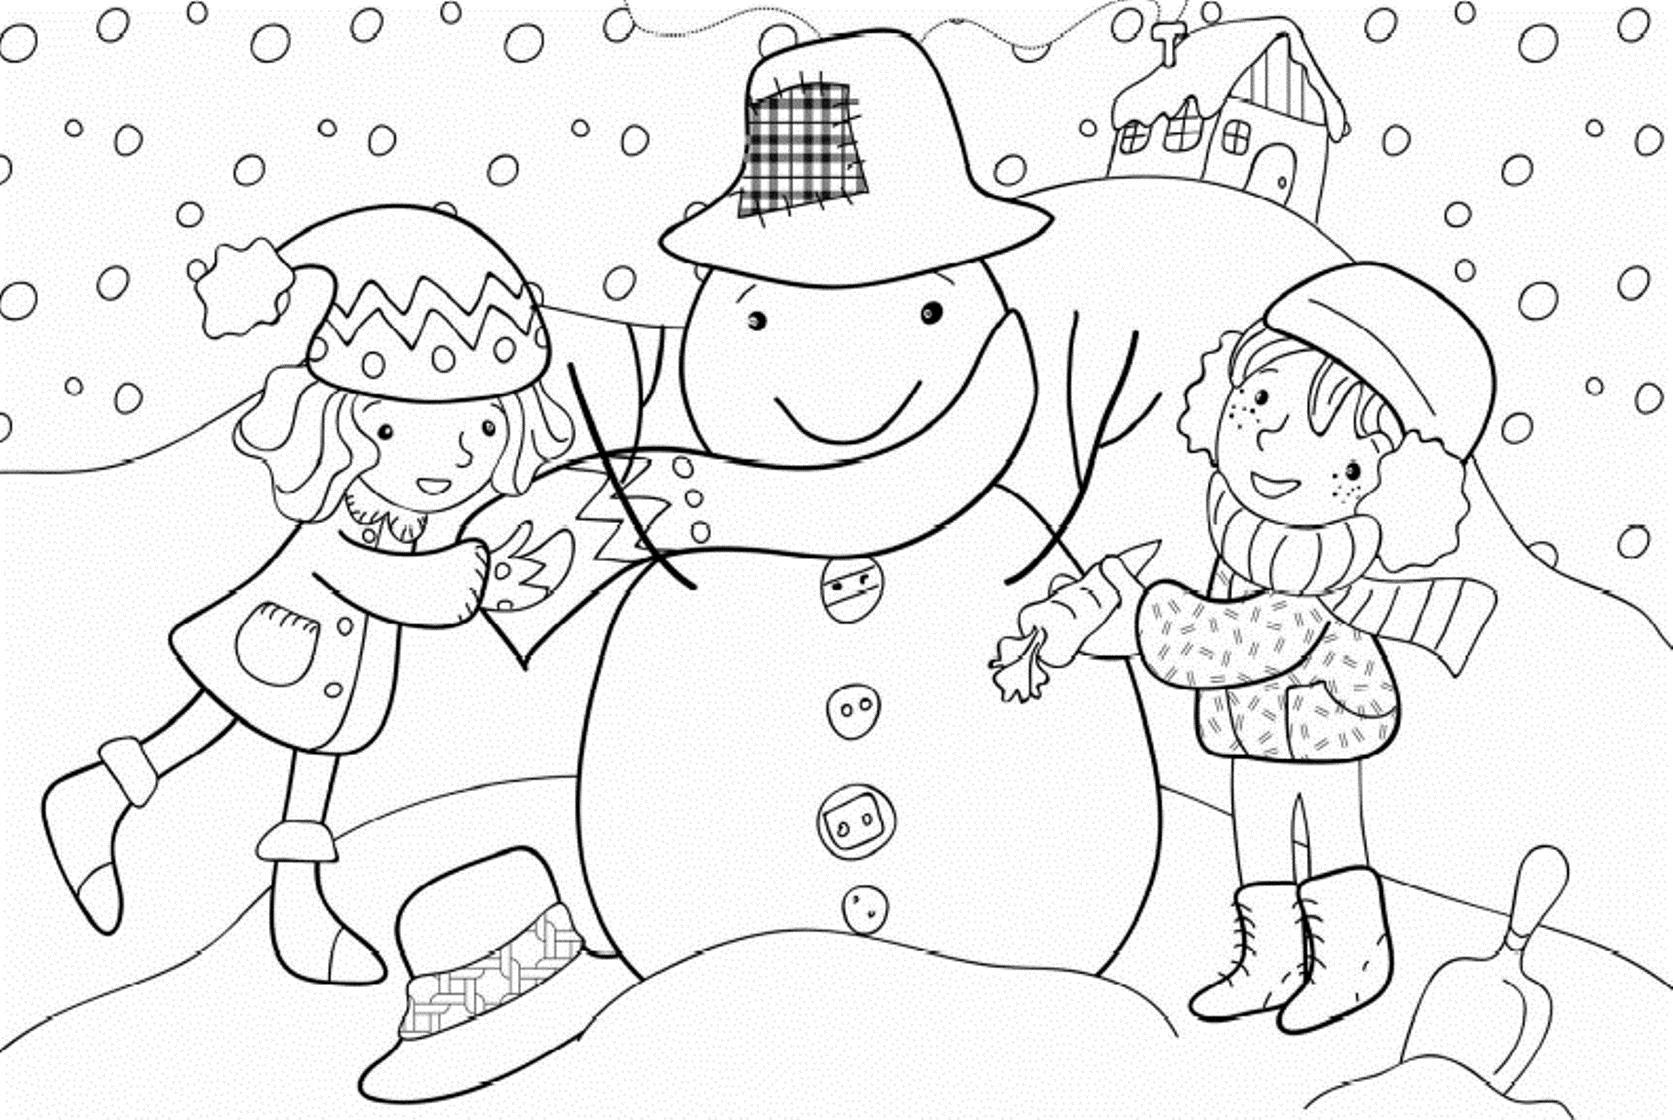 Девочки лепят снеговика Рисунок раскраска на зимнюю тему